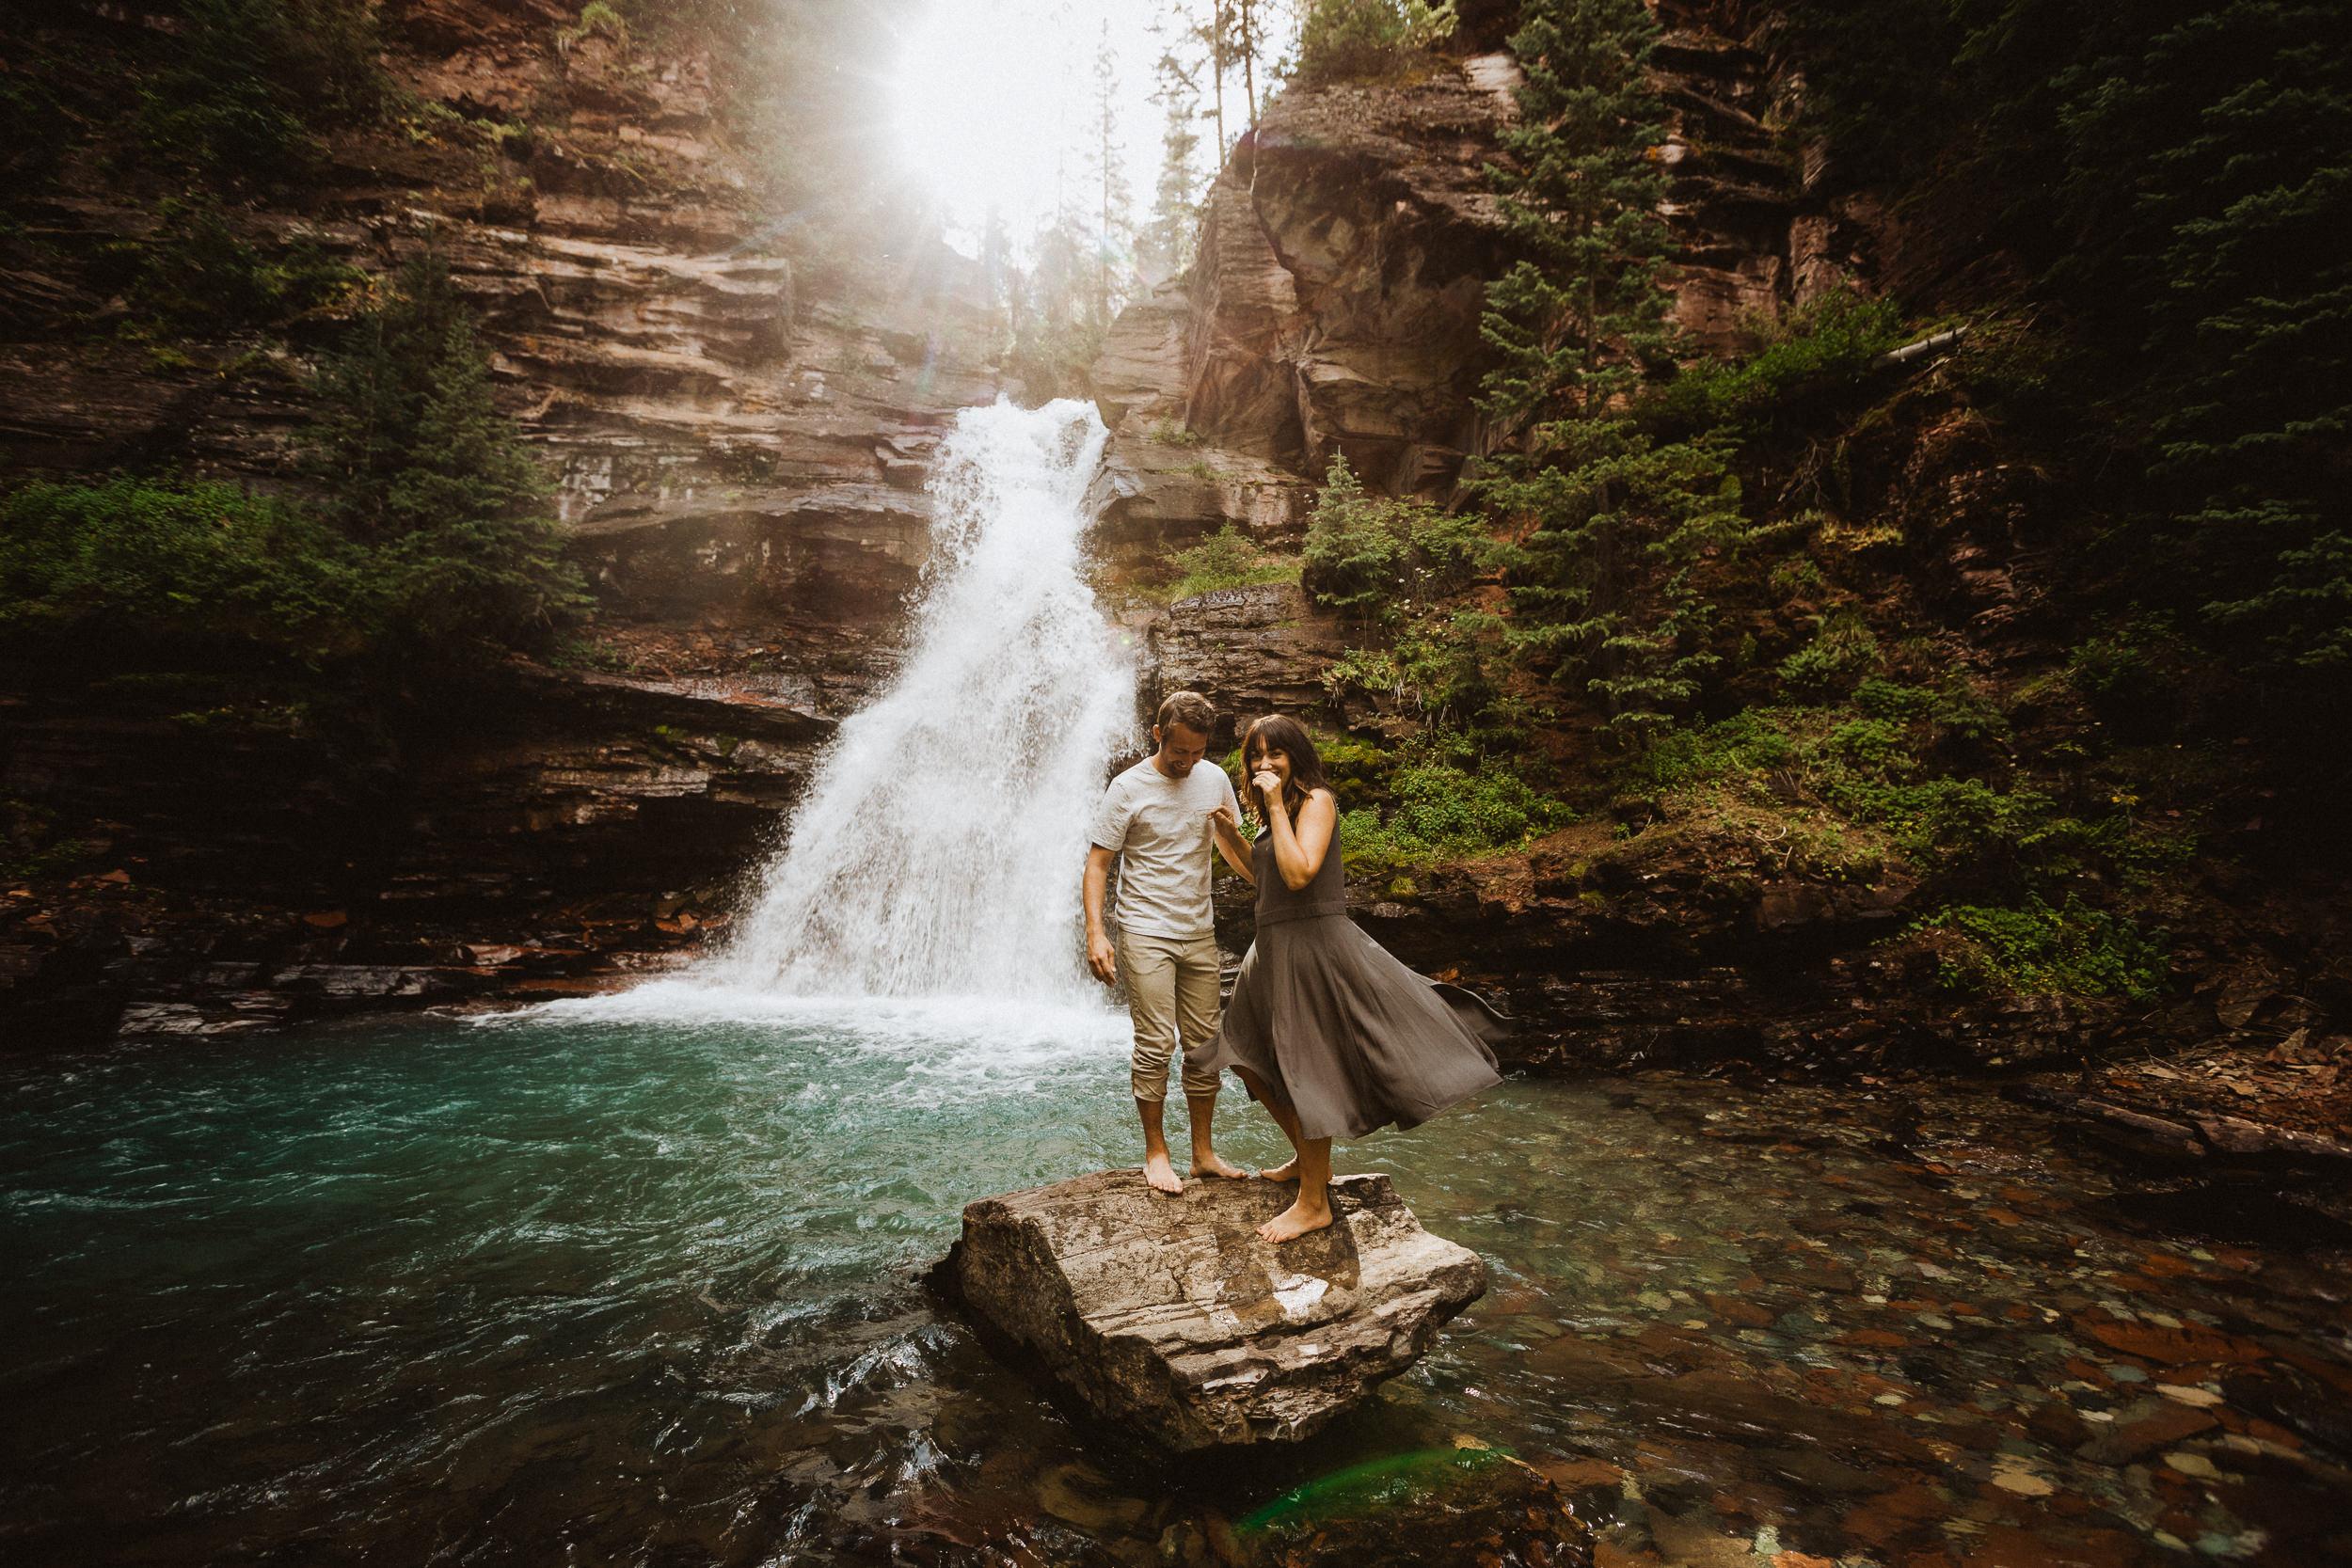 Waterfall in Silverton, Colorado